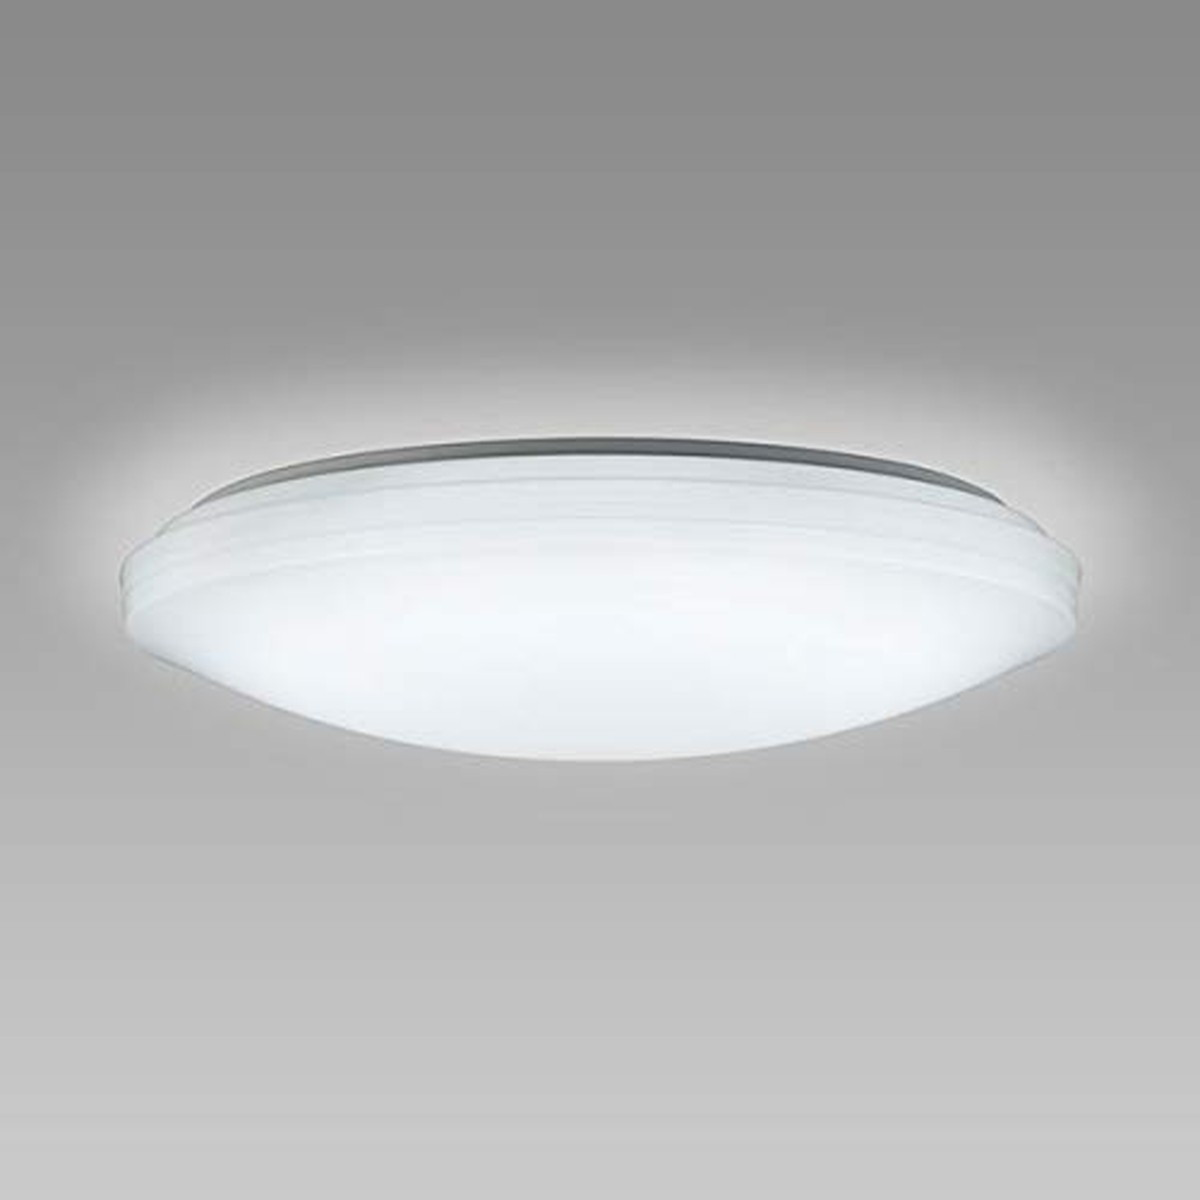 NEC HLDZ08208 [LEDシーリングライト (~8畳/調光/昼光色) リモコン有]【クーポン配布中】